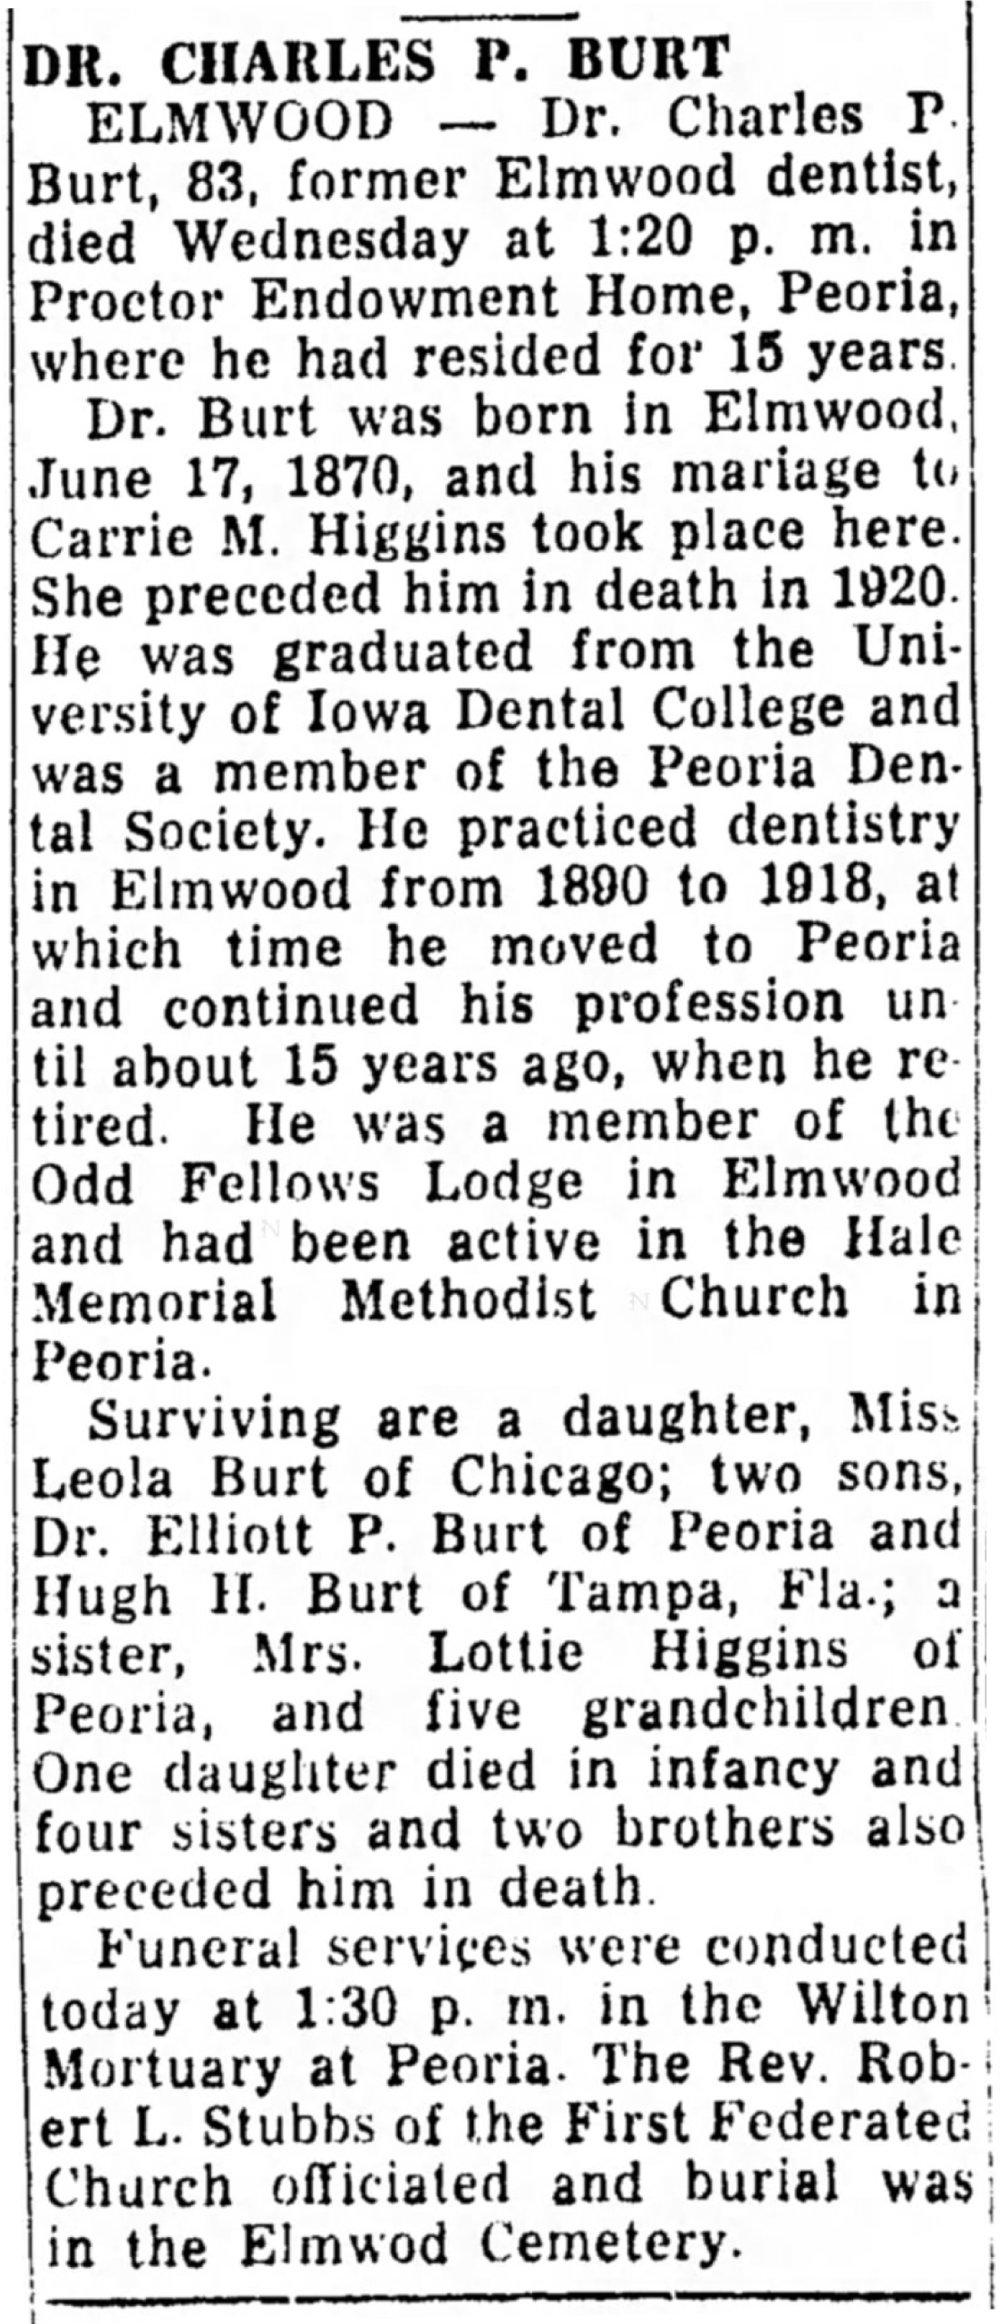 Galesburg Register-Mail (Galesburg, IL) Jan 29, 1954